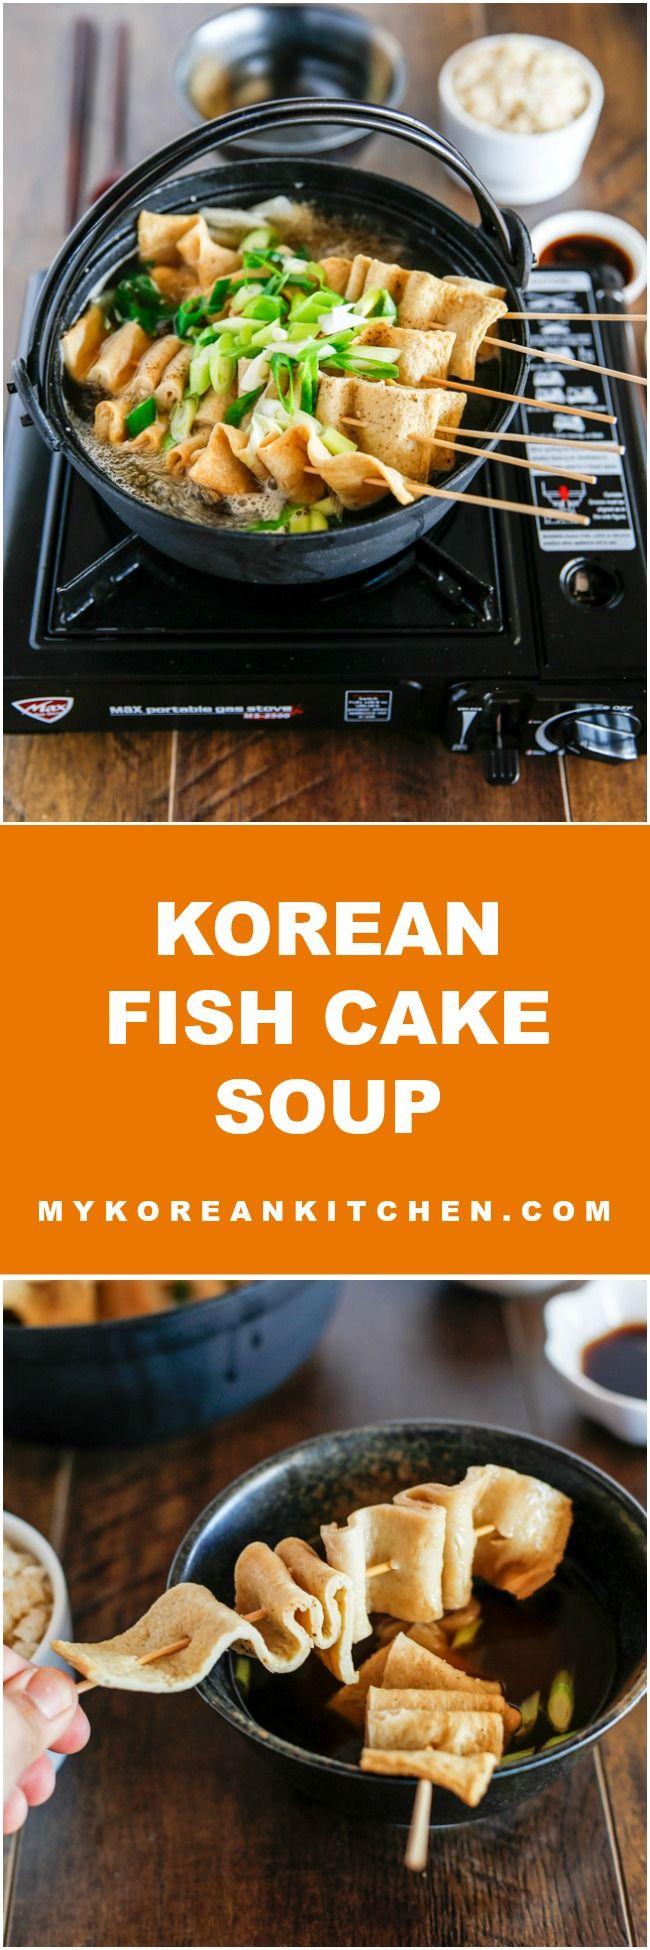 Korean fish cake recipe video